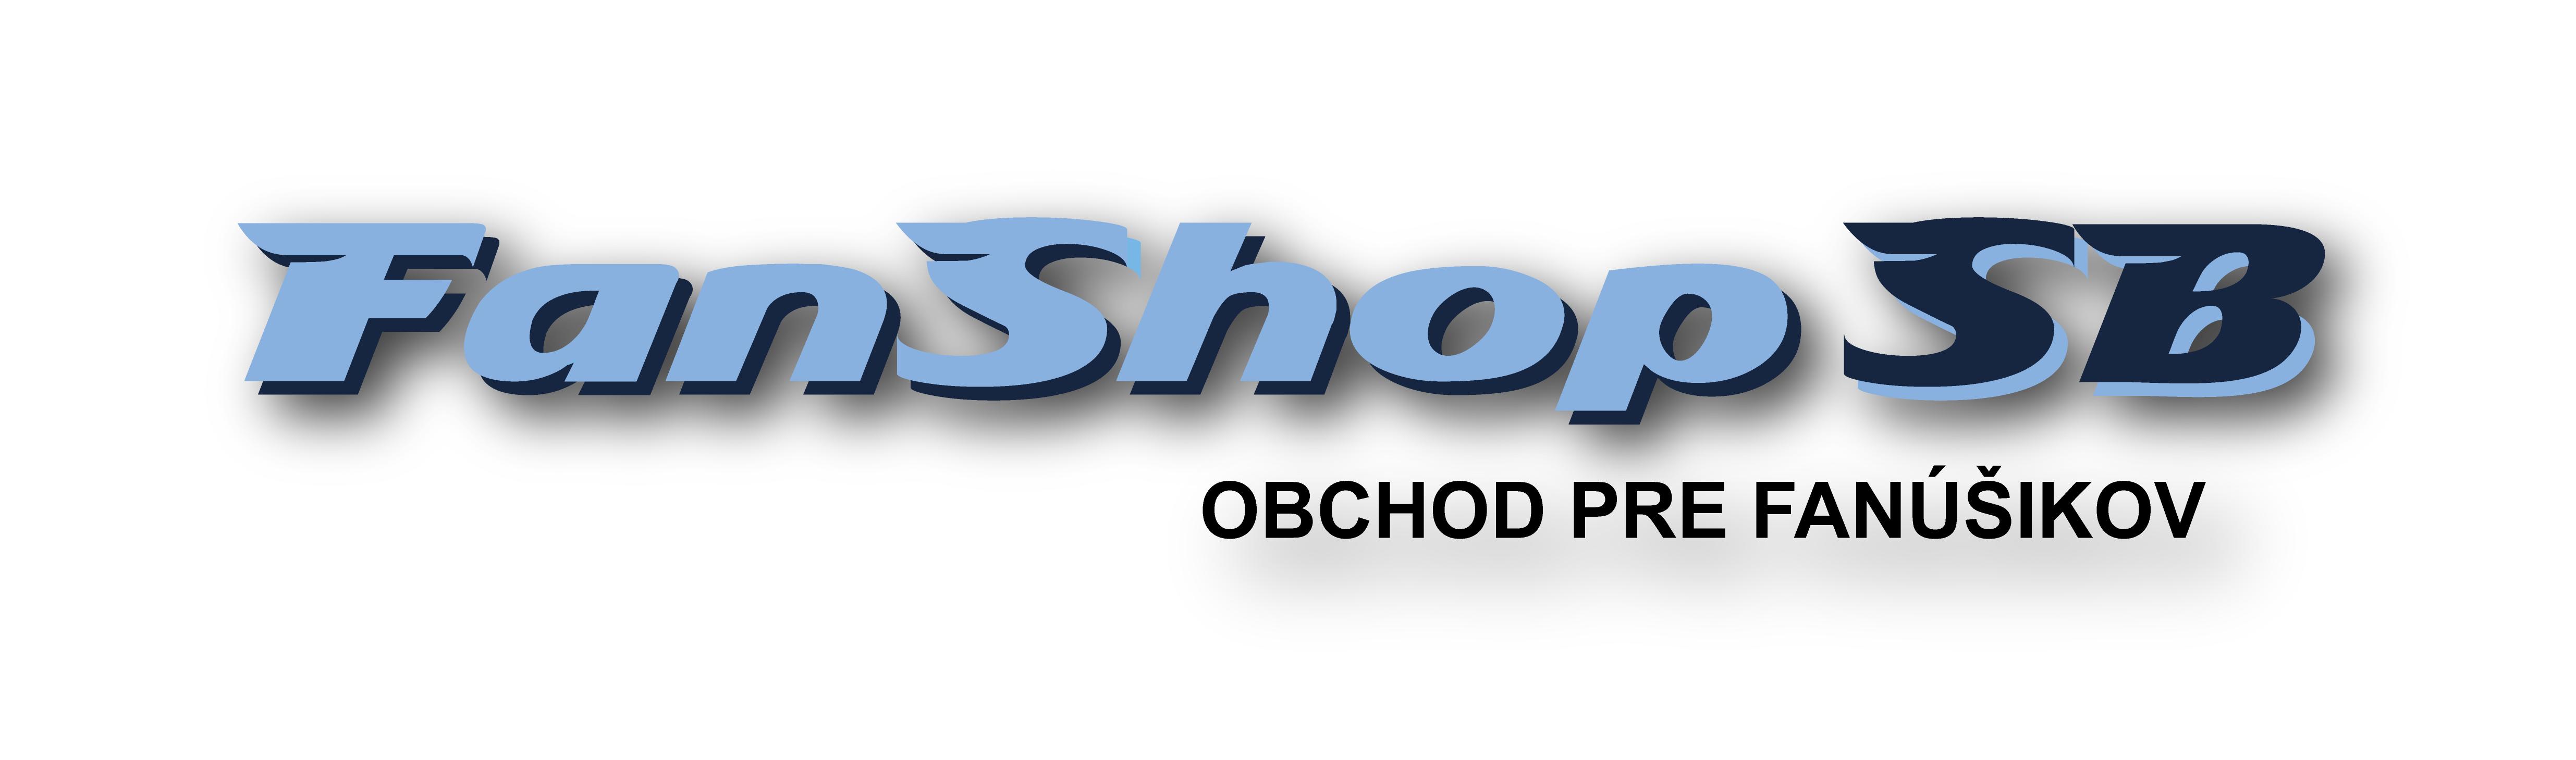 7bca4c8ccaab0 Hokejový dres HC Slovan znak biely DETSKÝ 2018/2019 - Fanshop SB